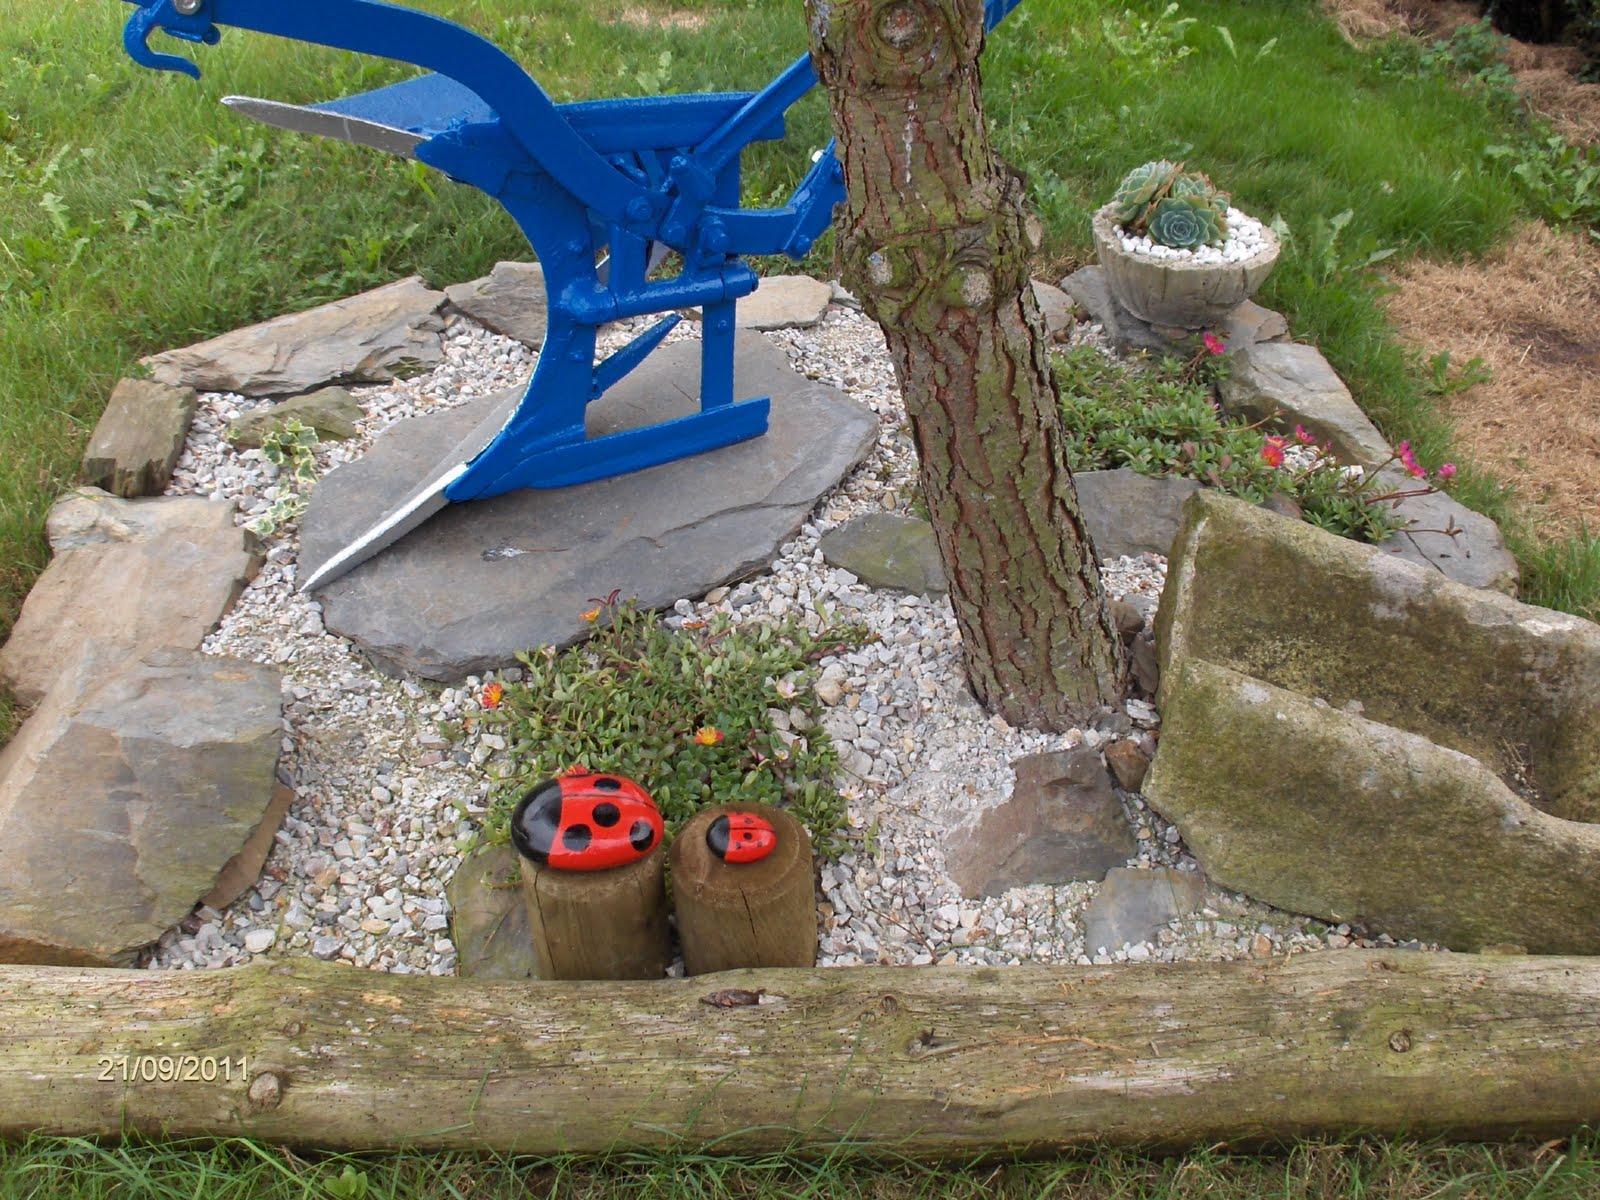 Aprendiz pintar piedras para decorar jard n unas mariquitas for Piedras para decorar jardines